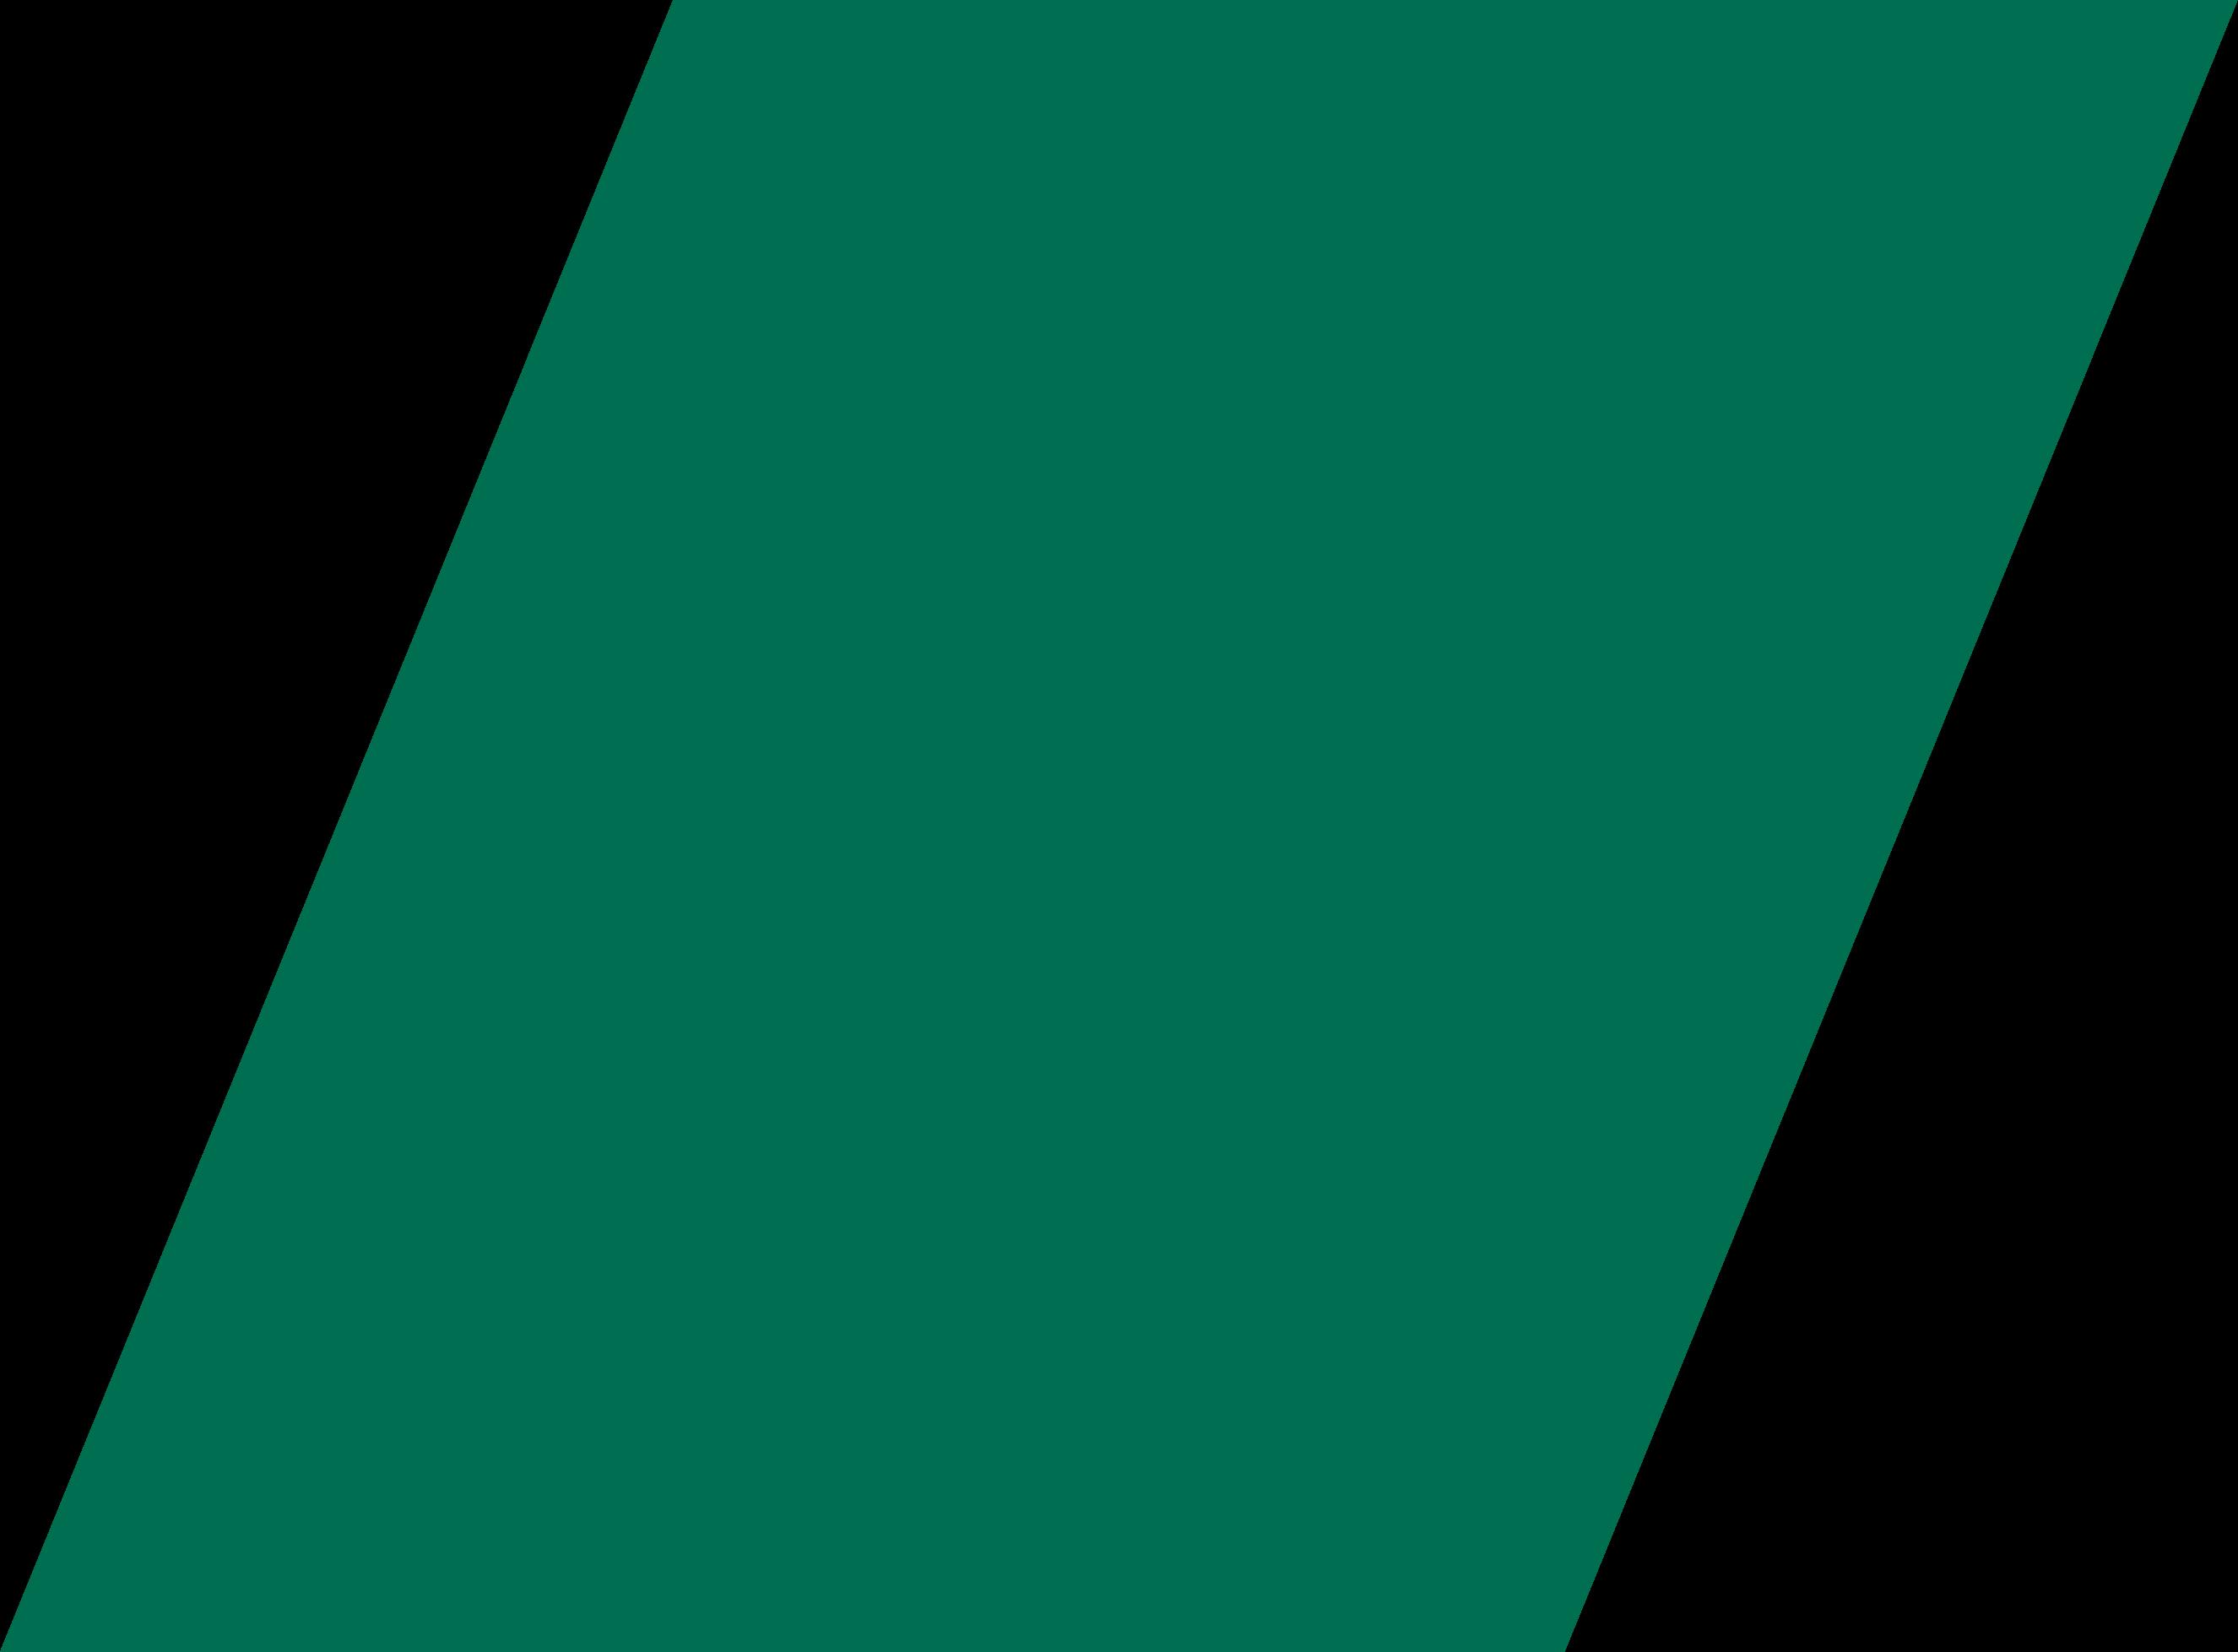 JFC green overlay